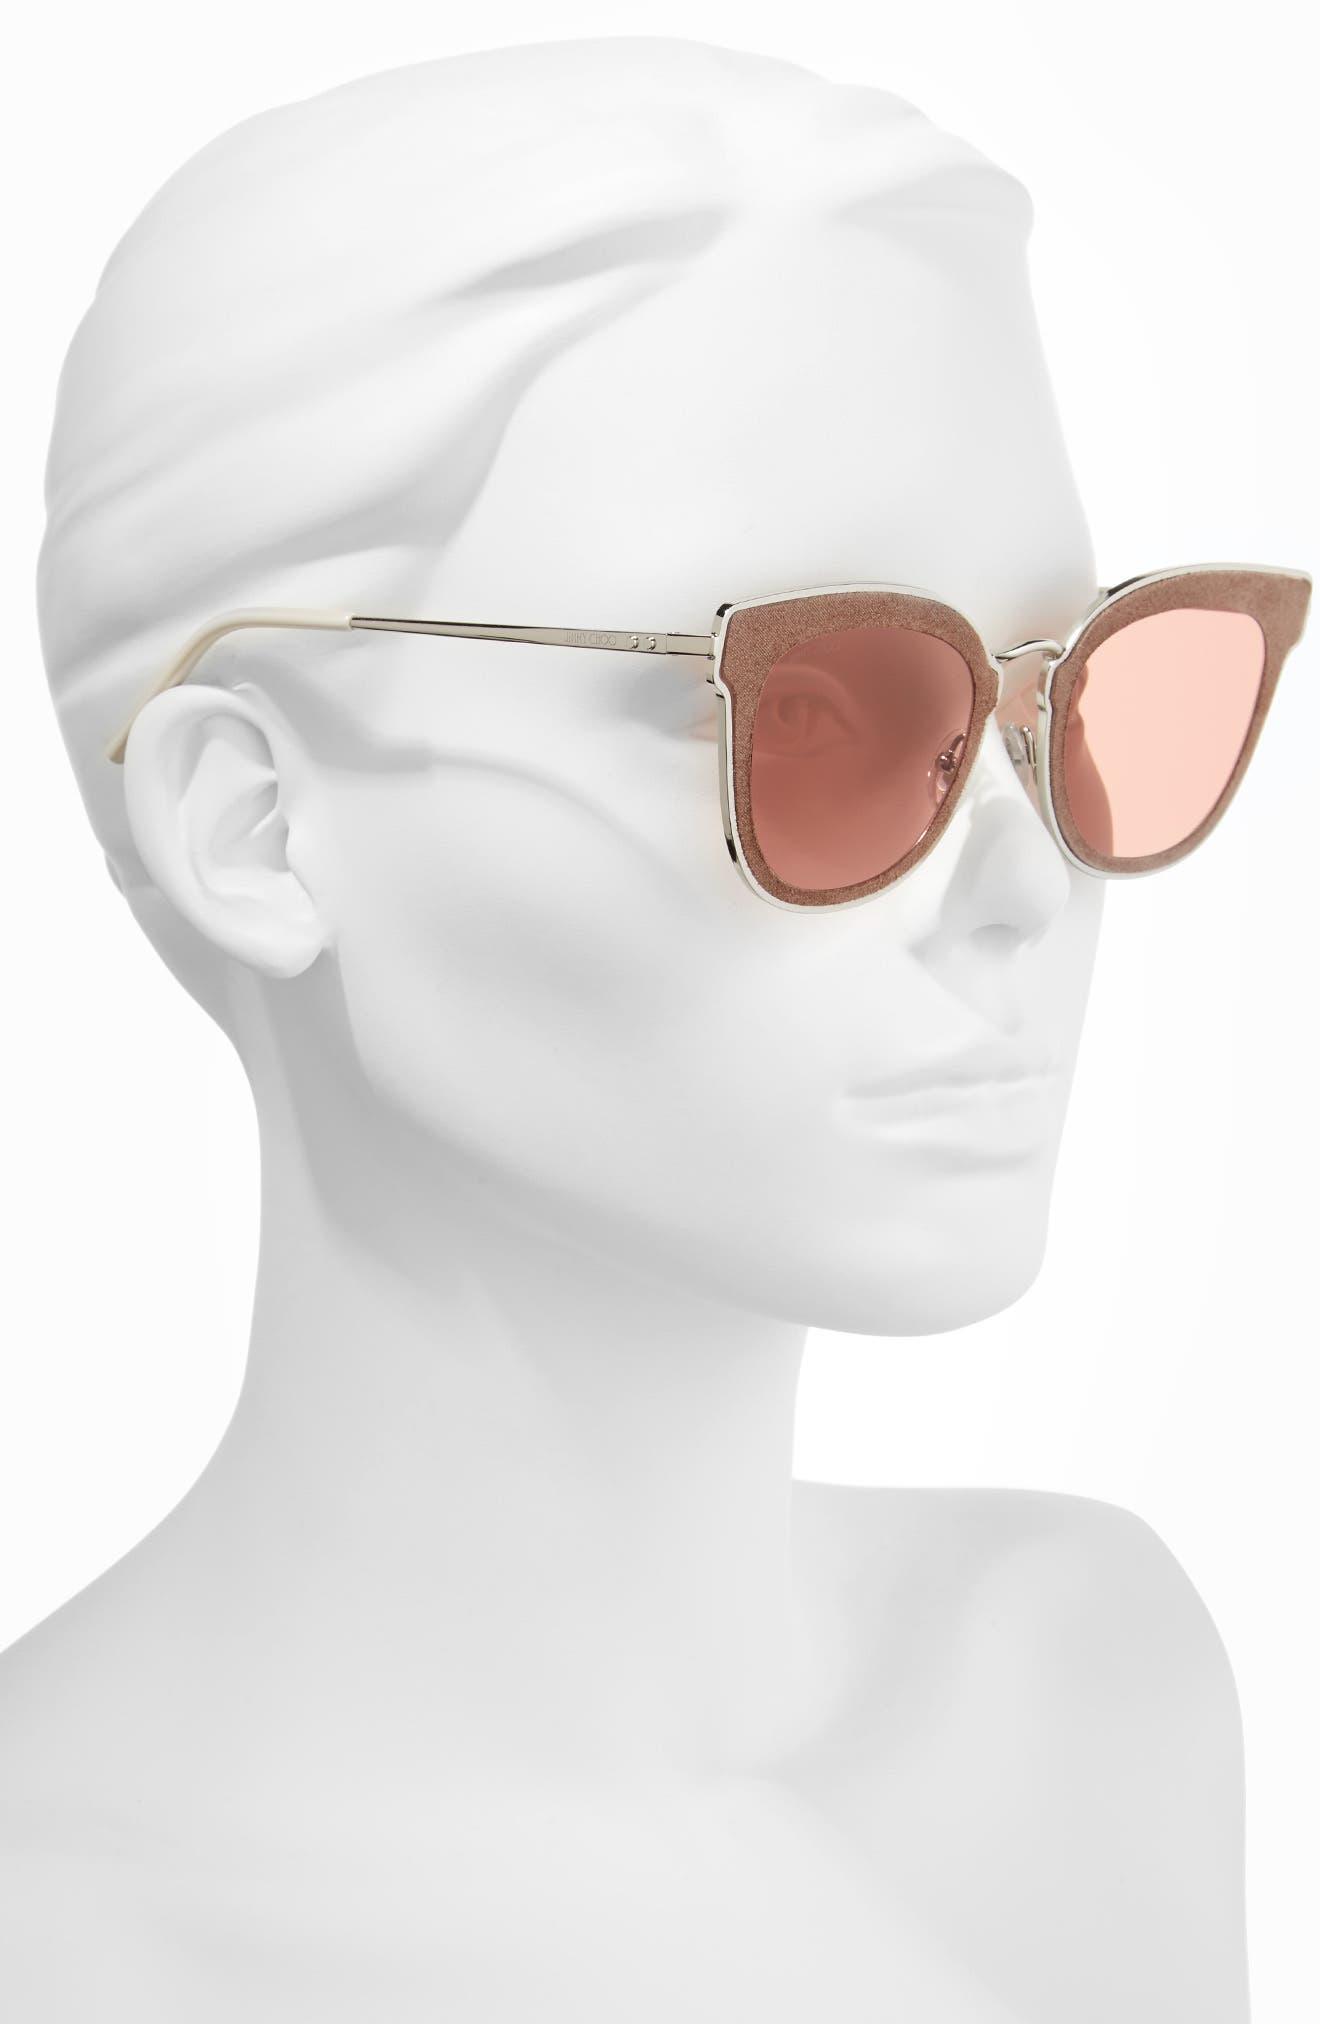 Niles 63mm Oversize Cat Eye Sunglasses,                             Alternate thumbnail 2, color,                             Silver Beige